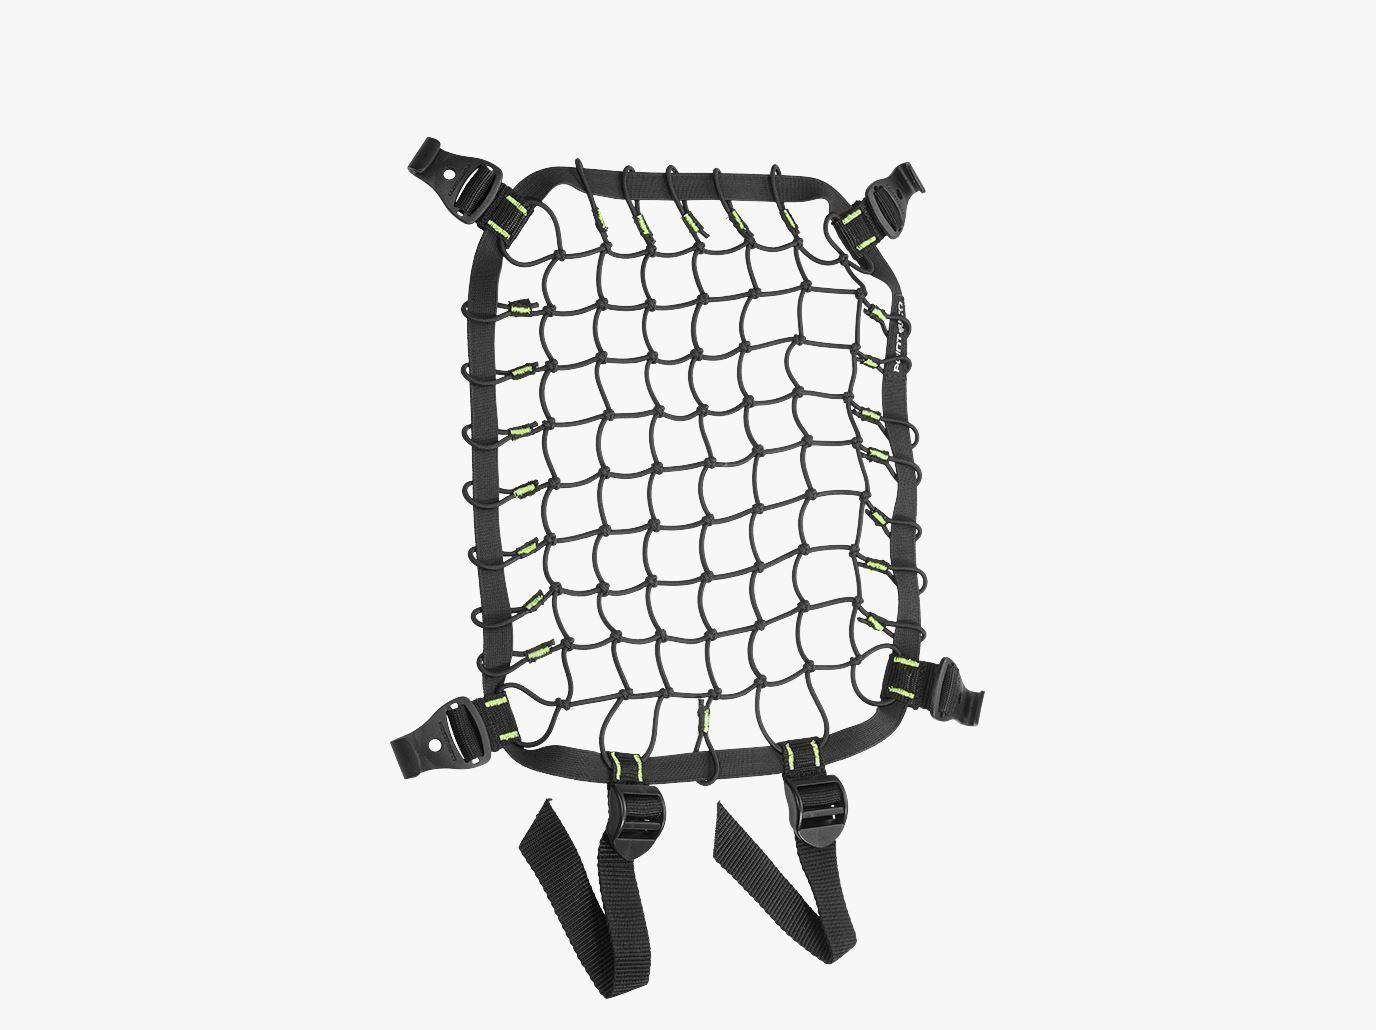 Boblbee Backpack 25l Helmet Cargo Net